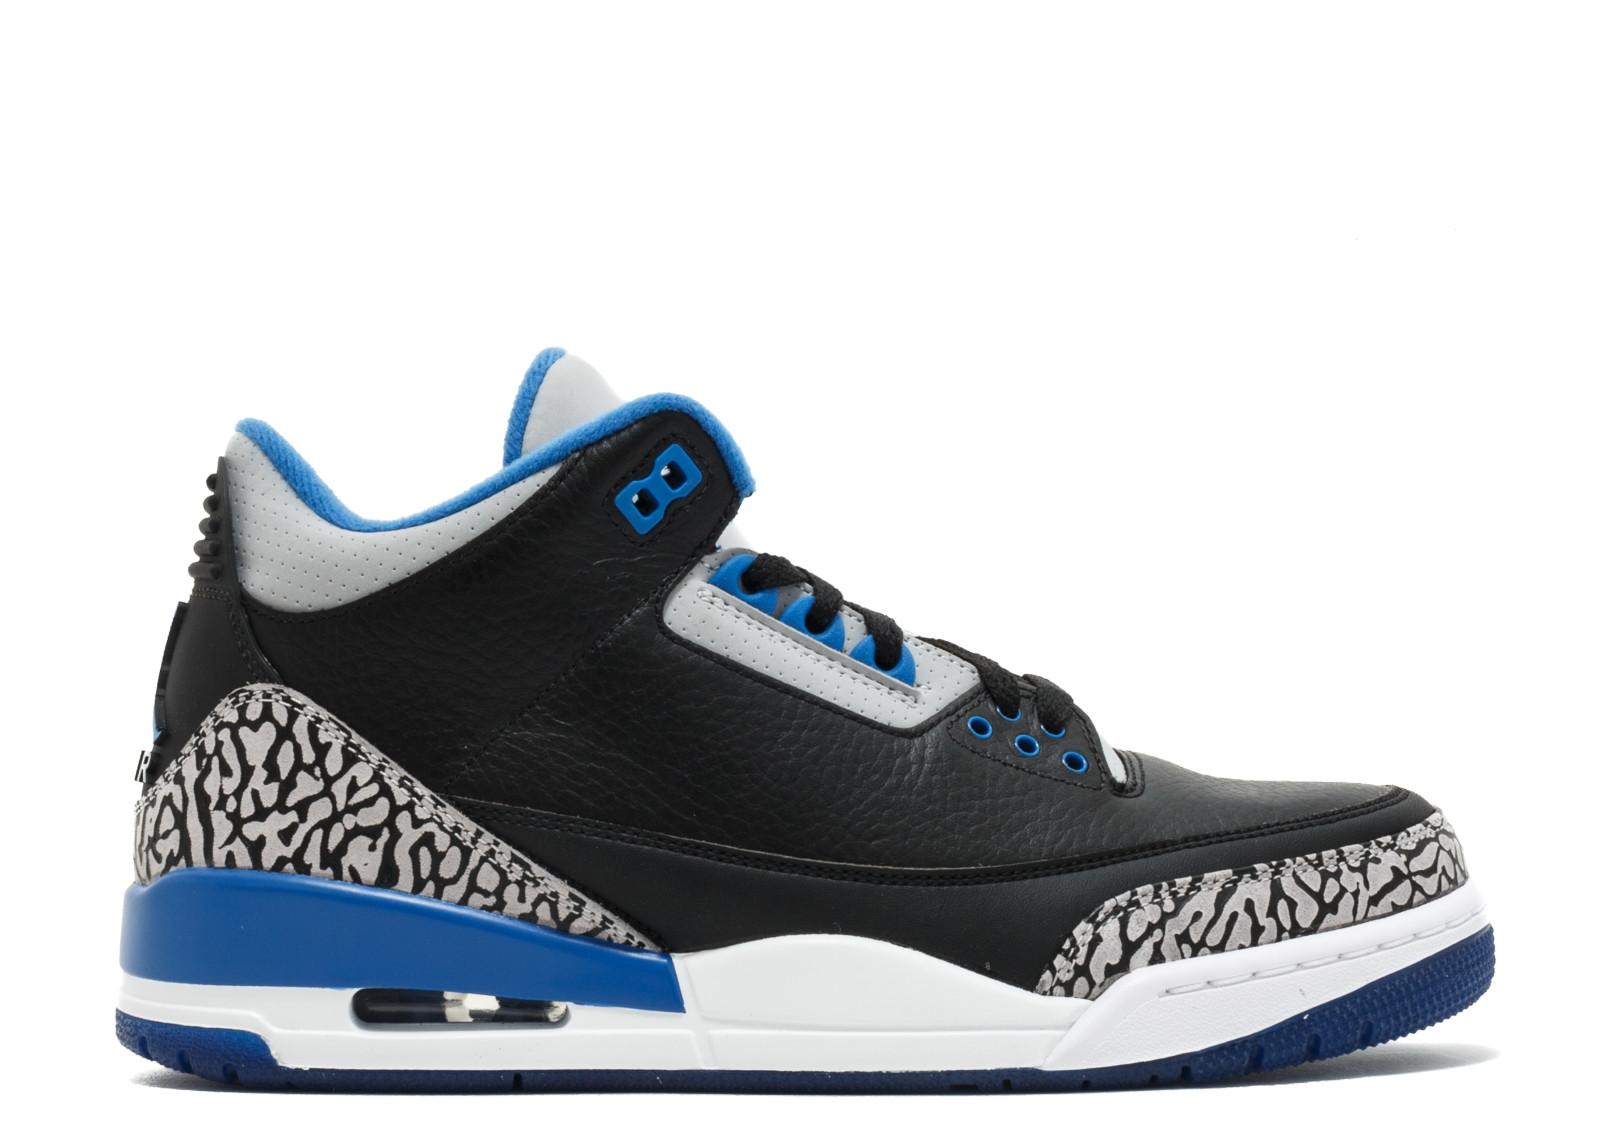 Kick Avenue - Jordan 3 Retro Sport Blue